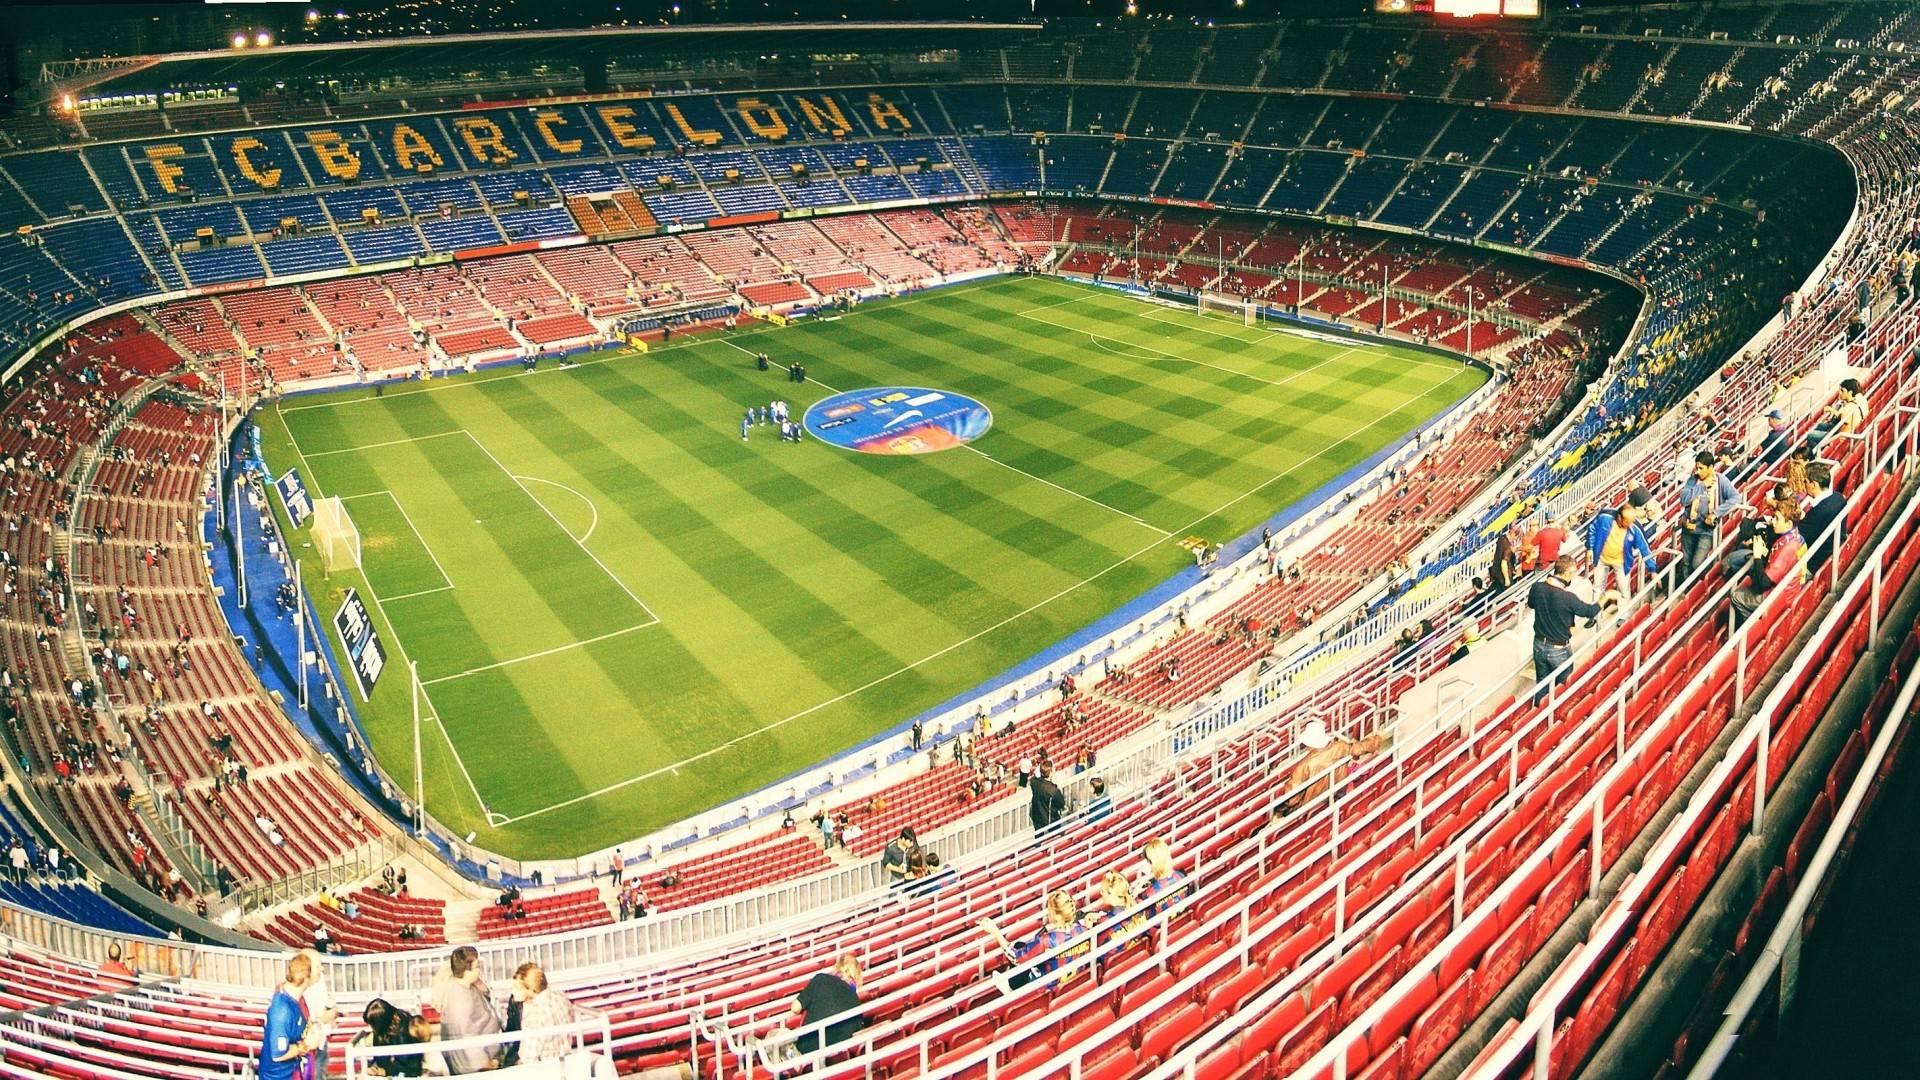 Стадион камп ноу в барселоне (испания) — фото, вместимость, реконструкция — плейсмент